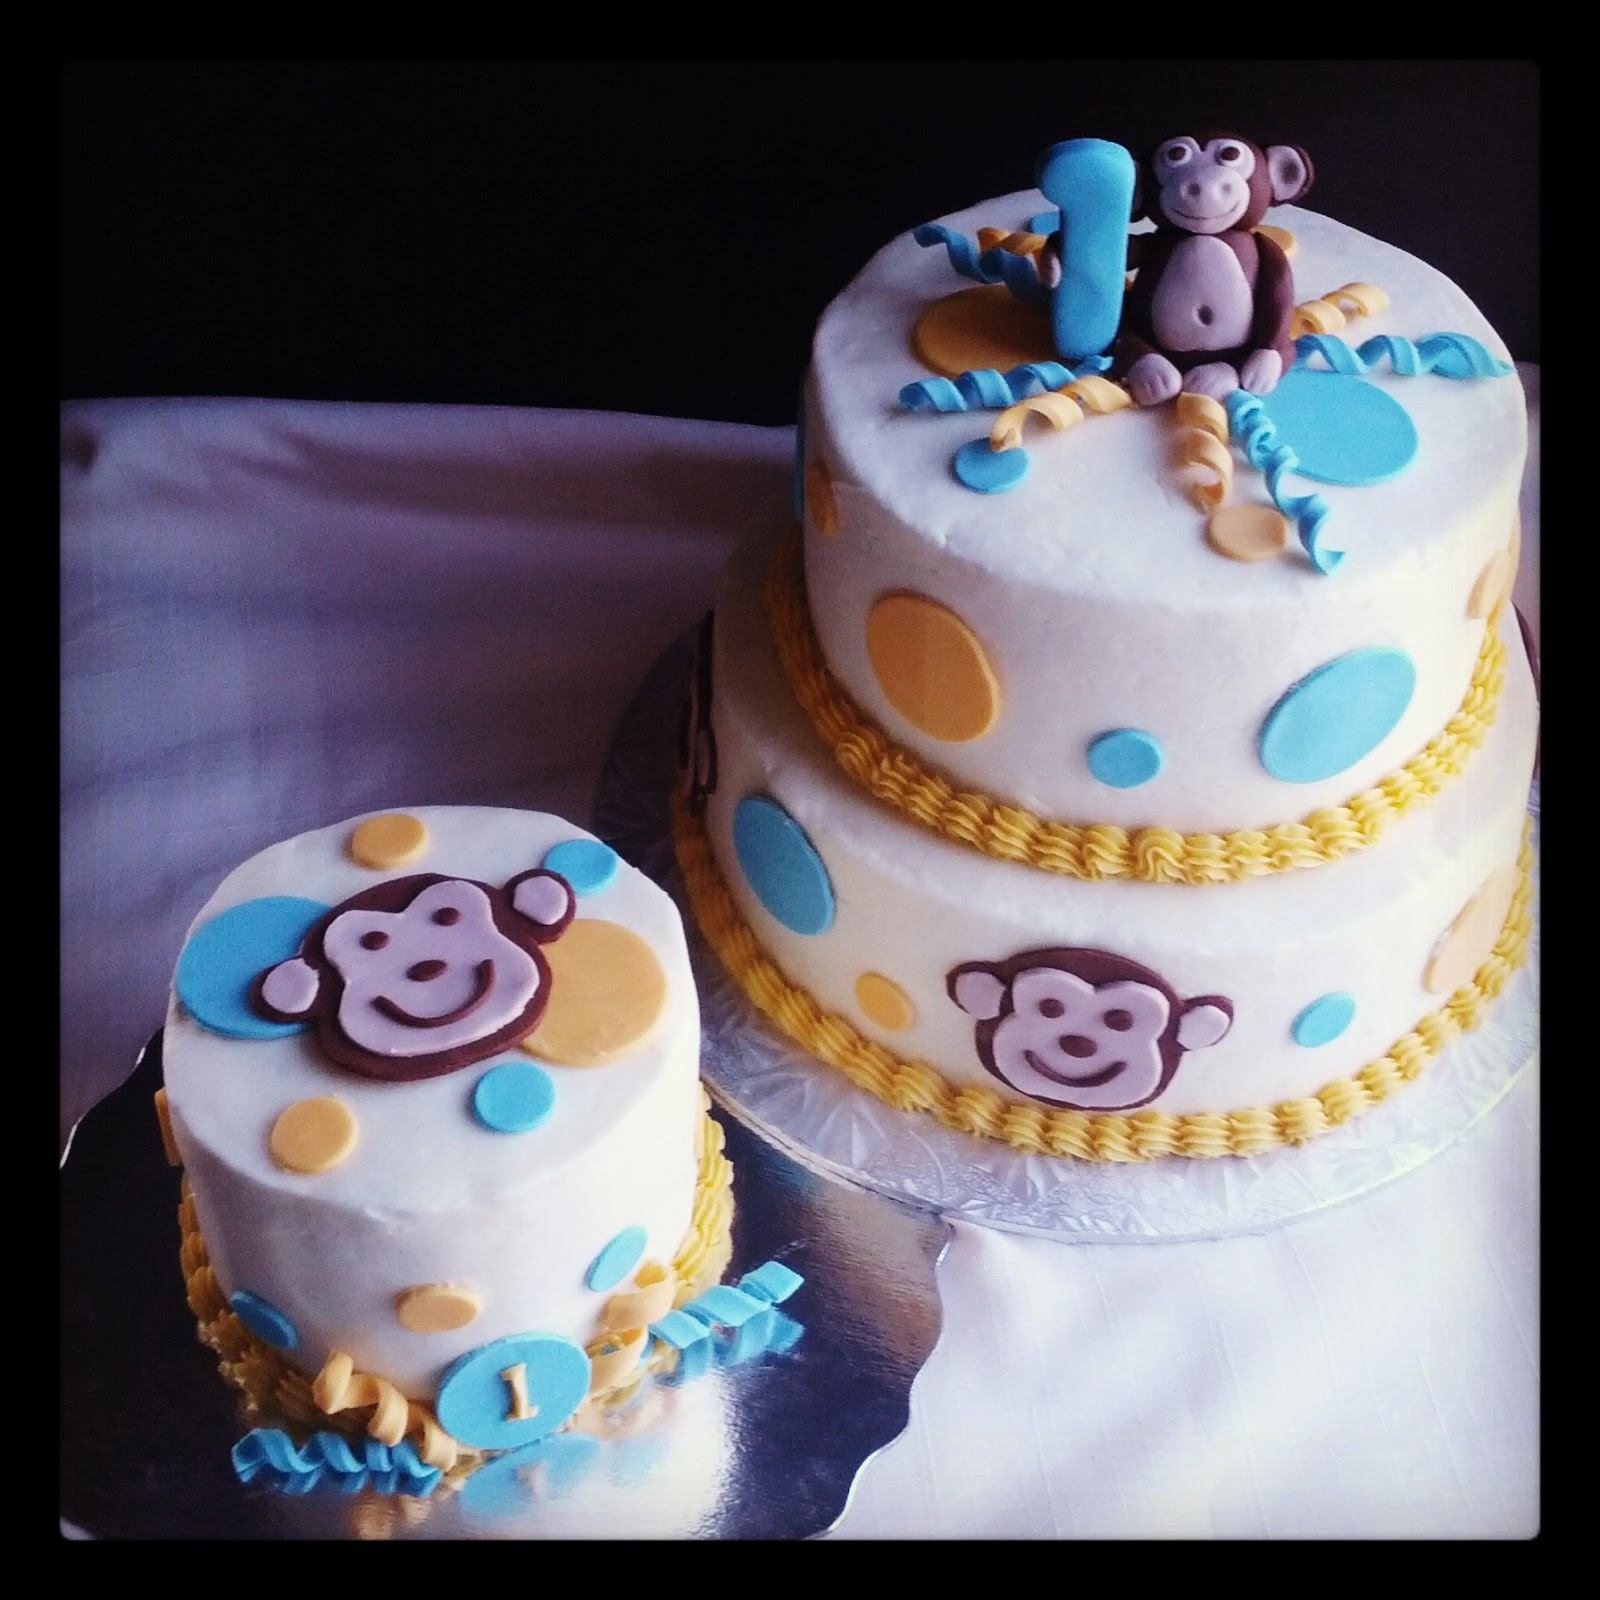 Second Generation Cake Design: July 2013